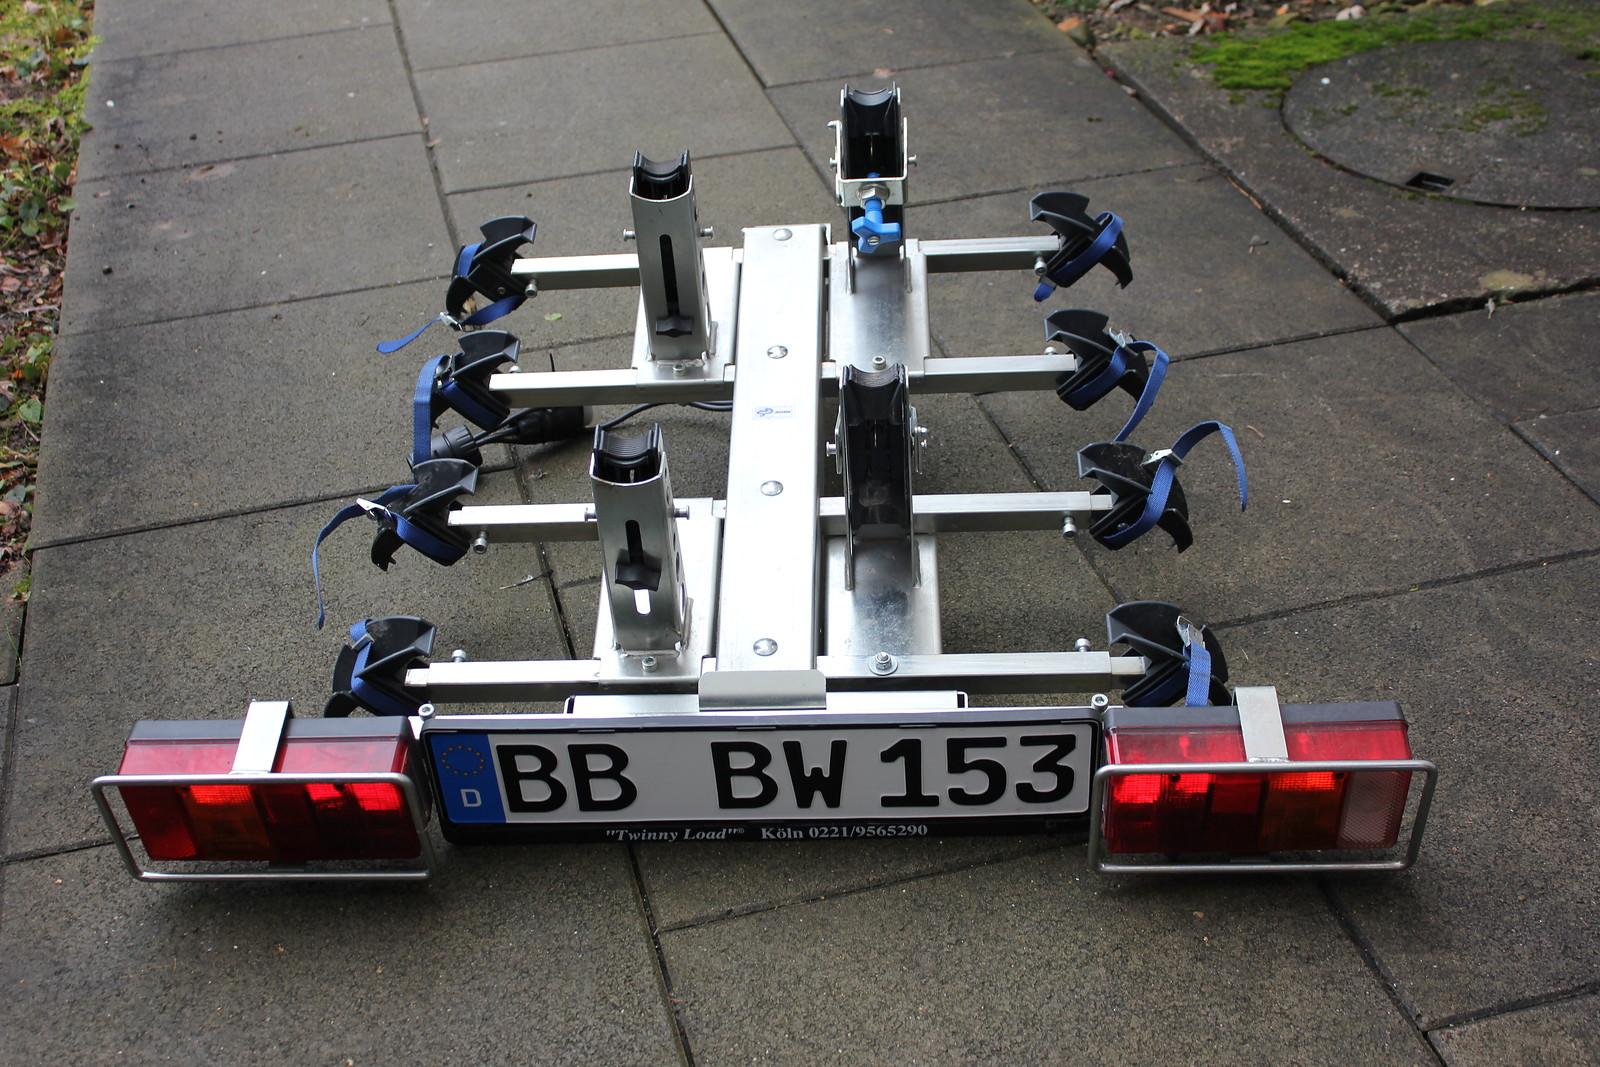 twinny load fahrradtr ger quattro bikemarkt mtb. Black Bedroom Furniture Sets. Home Design Ideas